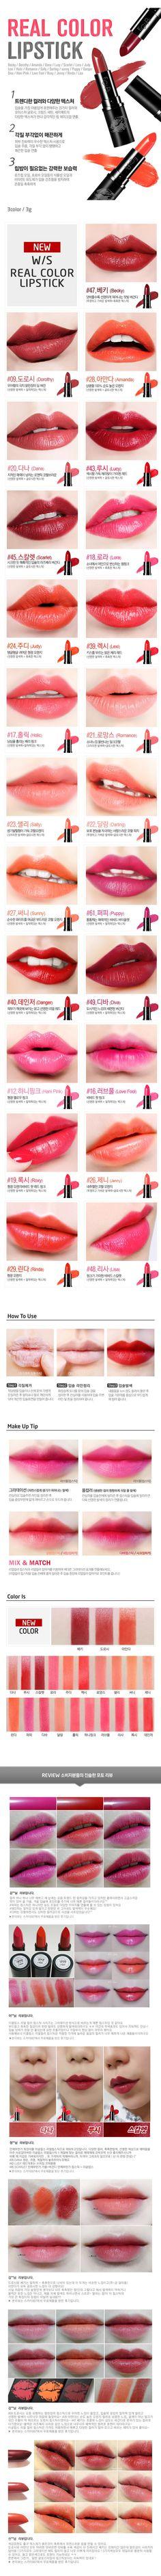 150 Best Im Gonna Buy These Images On Pinterest Stuff To Casio Ltp 1095q 9a Womenamp039s Quartz Watch Lipstick Colors Lipsticks South Korea Fashion Korean